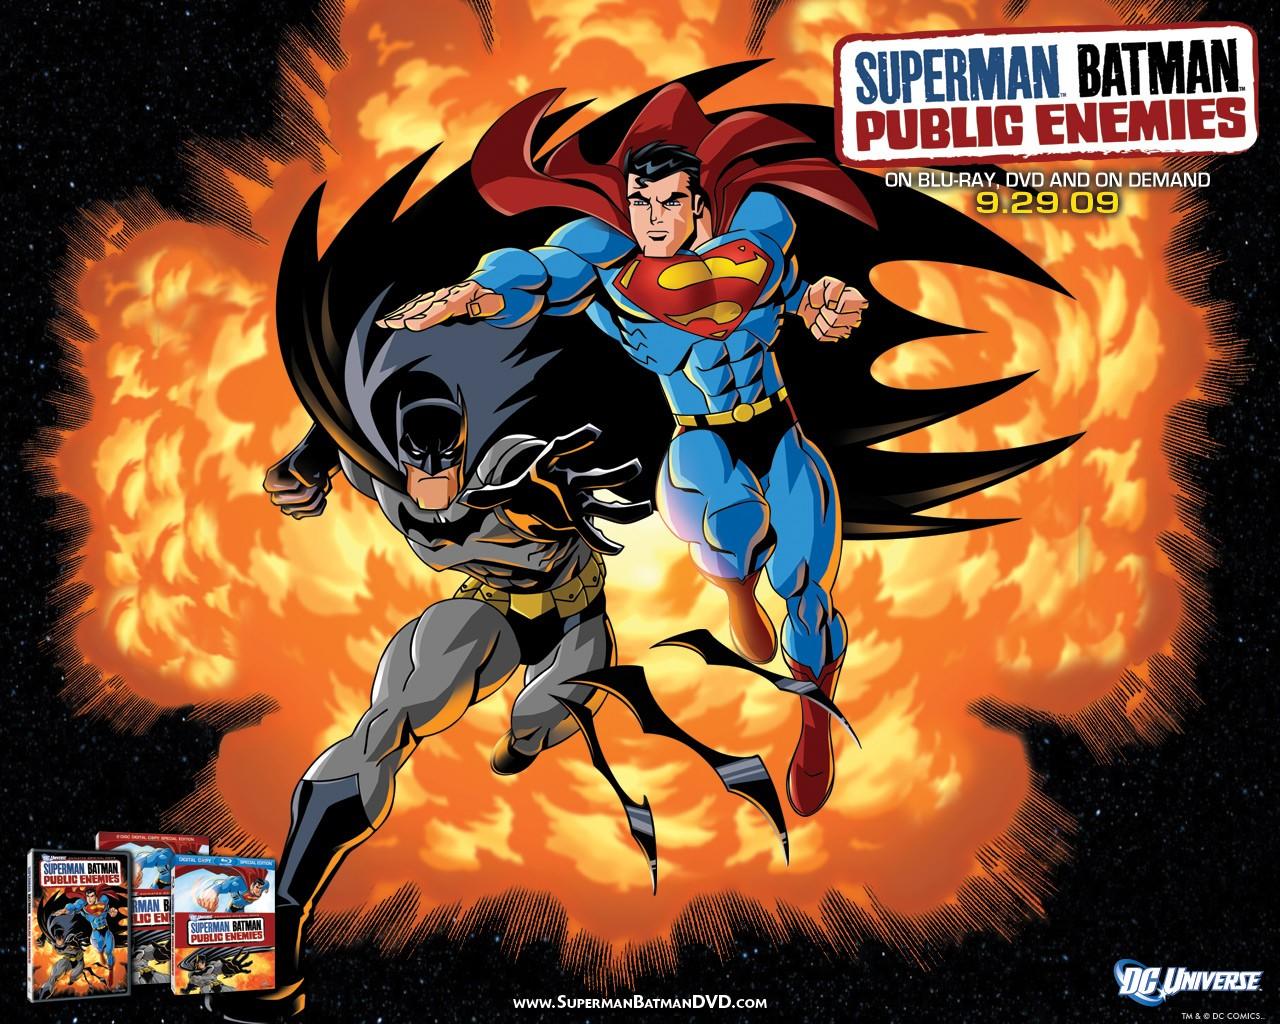 batman and superman cartoon wallpaper - photo #24